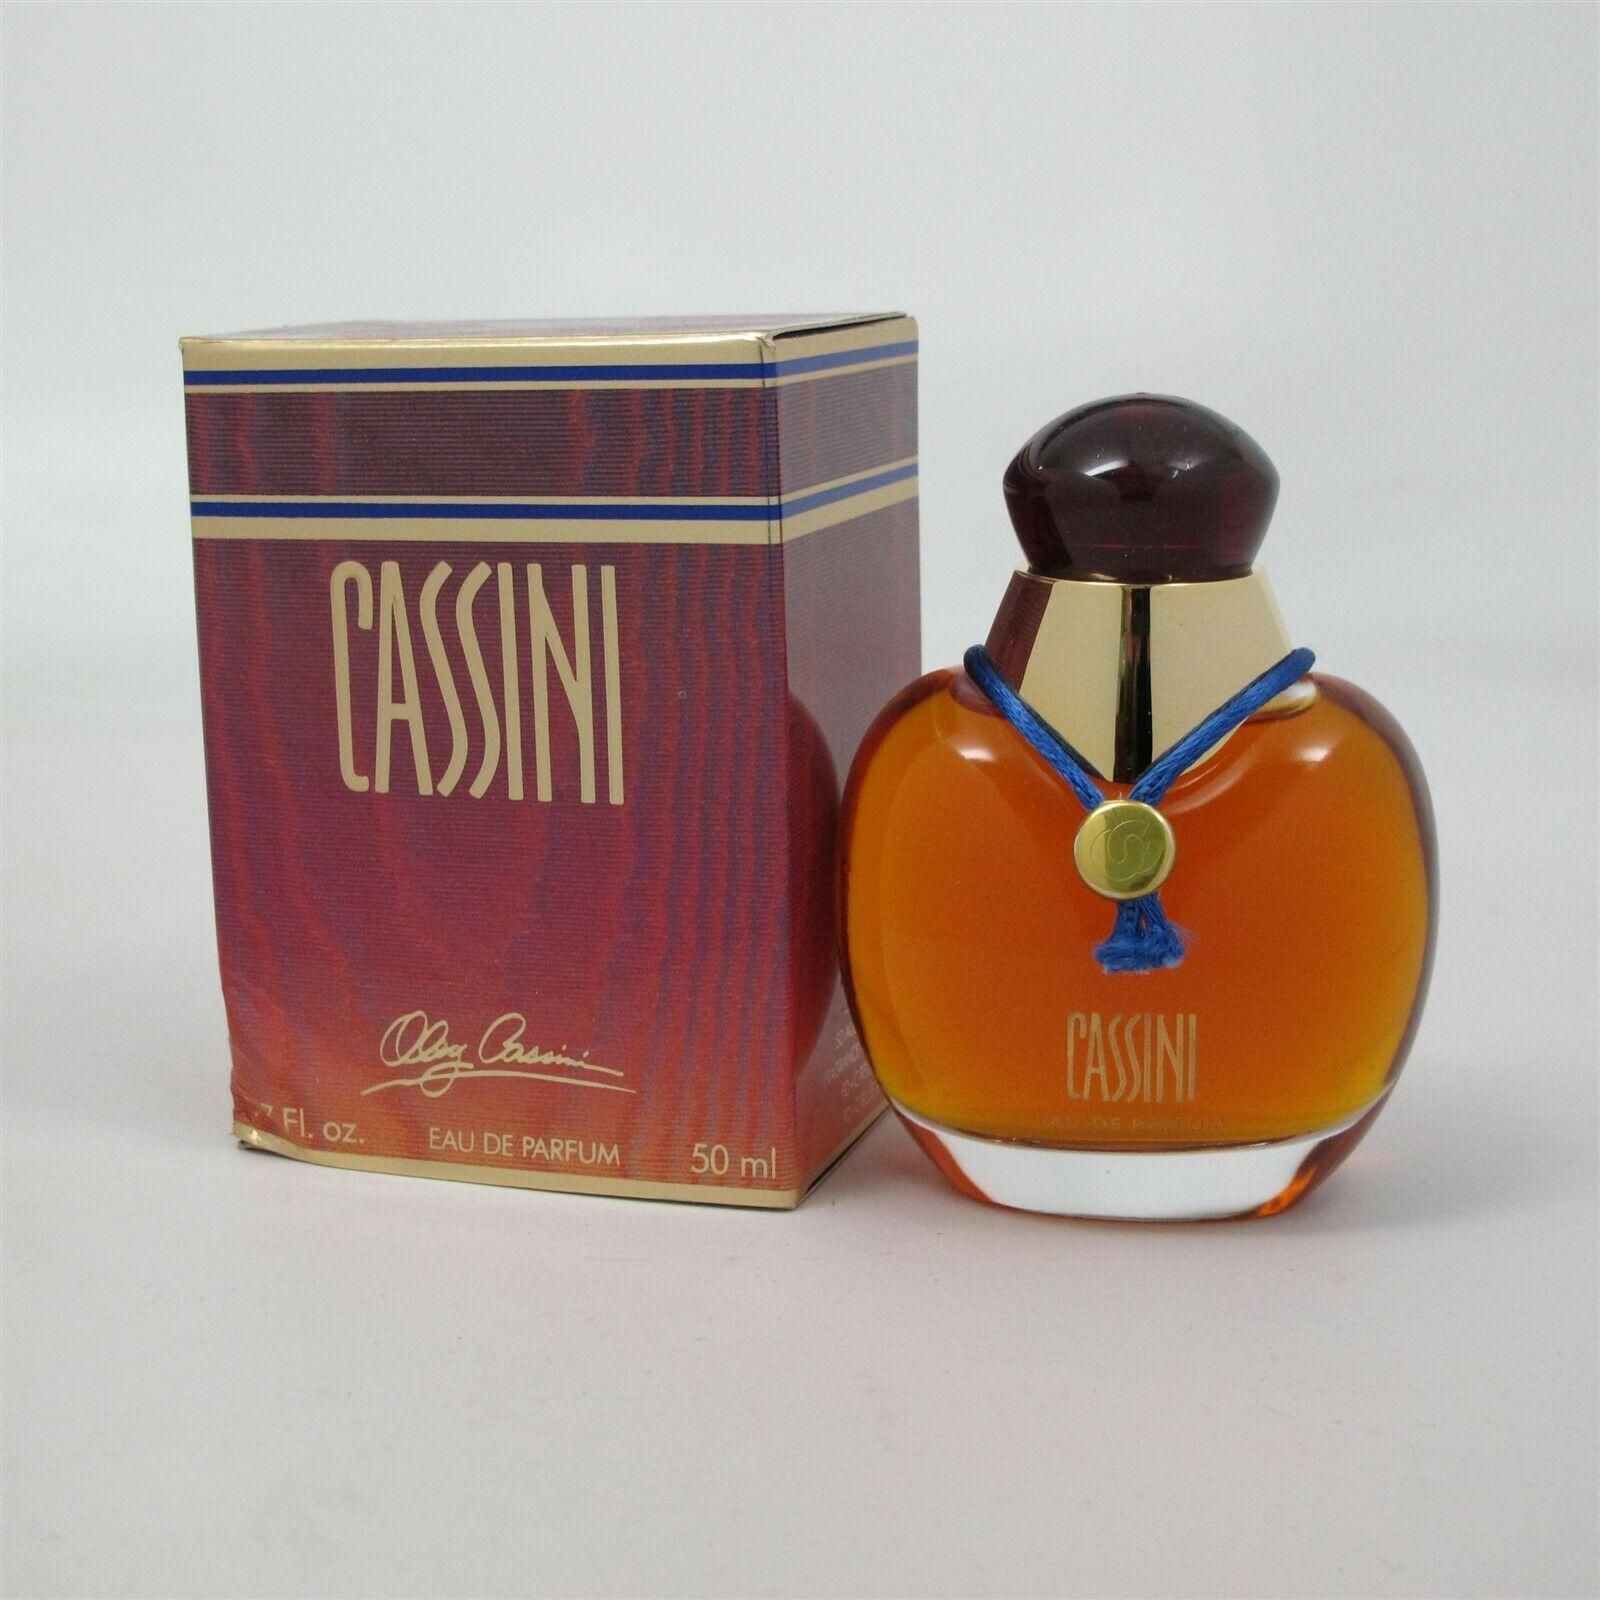 CASSINI by Oleg Cassini 50 ml/ 1.6 oz Eau de Parfum Splash **SEE NOTES** - $79.19